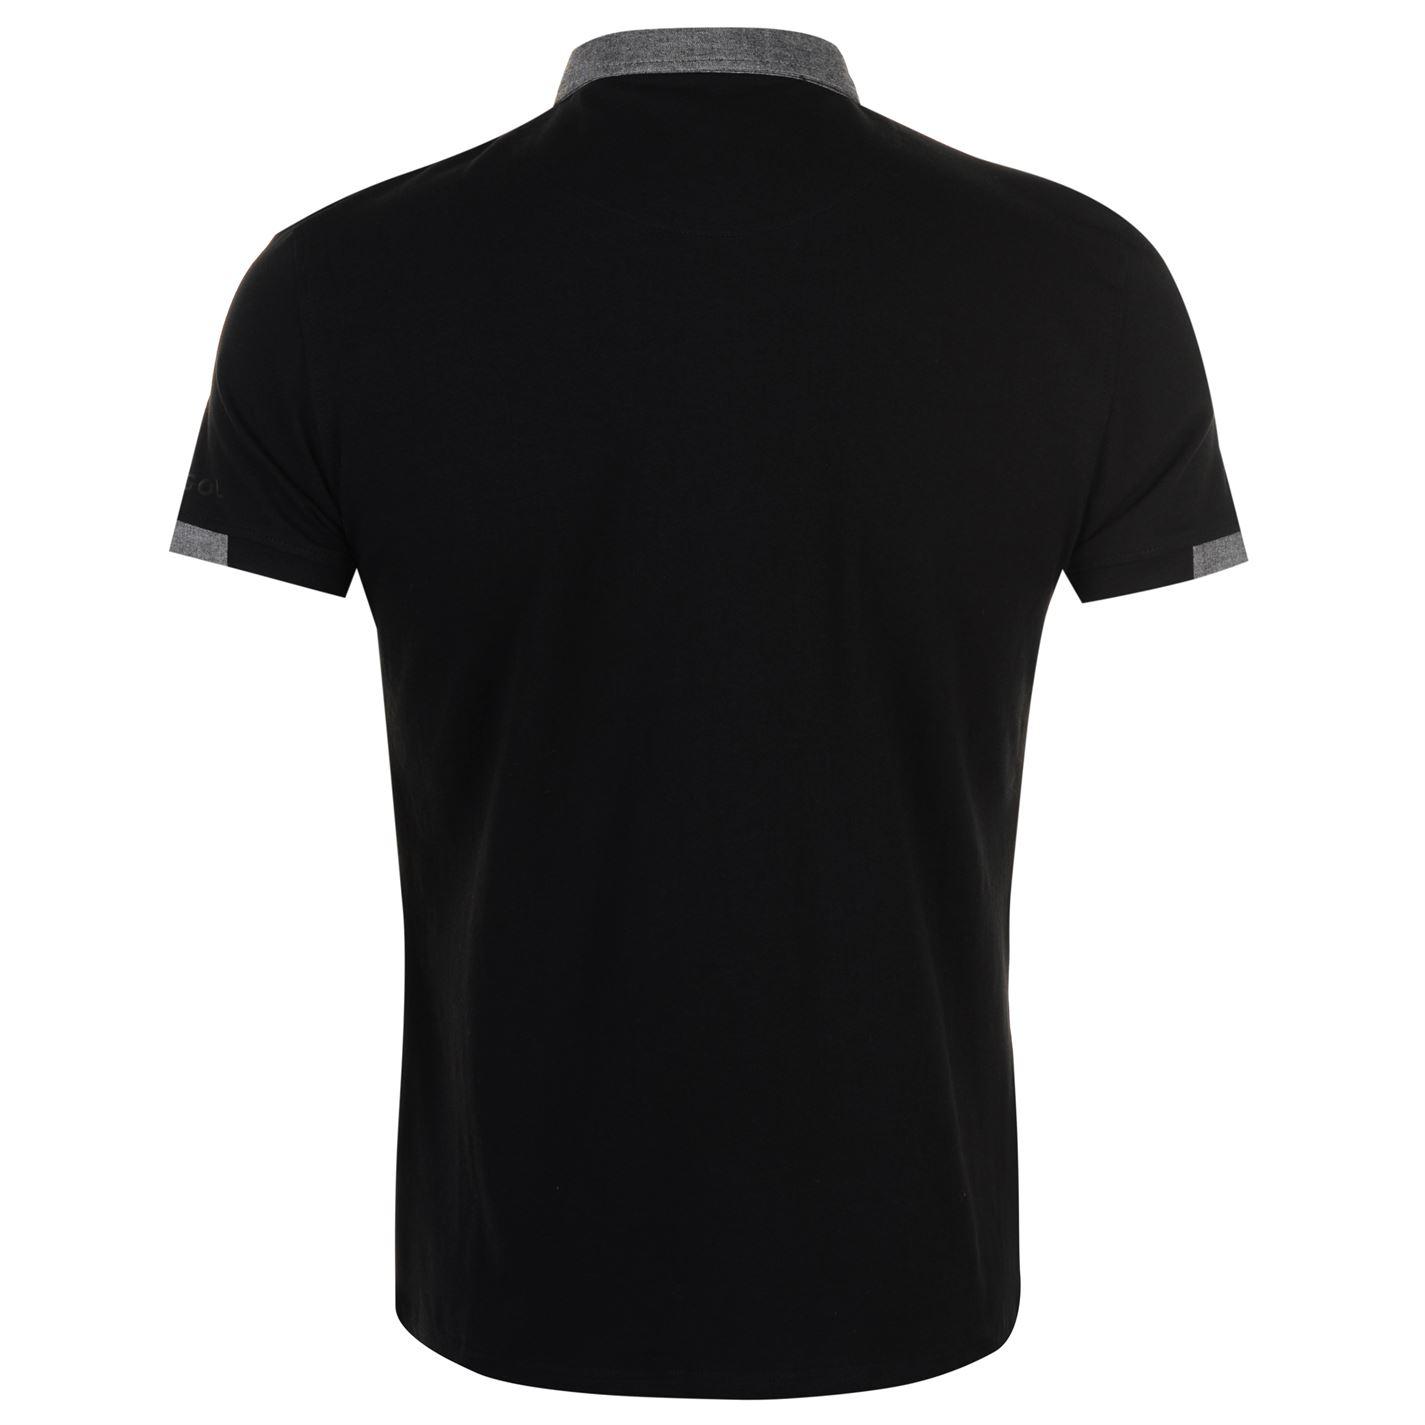 Kangol-Mens-Cham-Short-Sleeve-Polo-Shirt-Classic-Fit-Tee-Top-Lightweight-Colour thumbnail 5